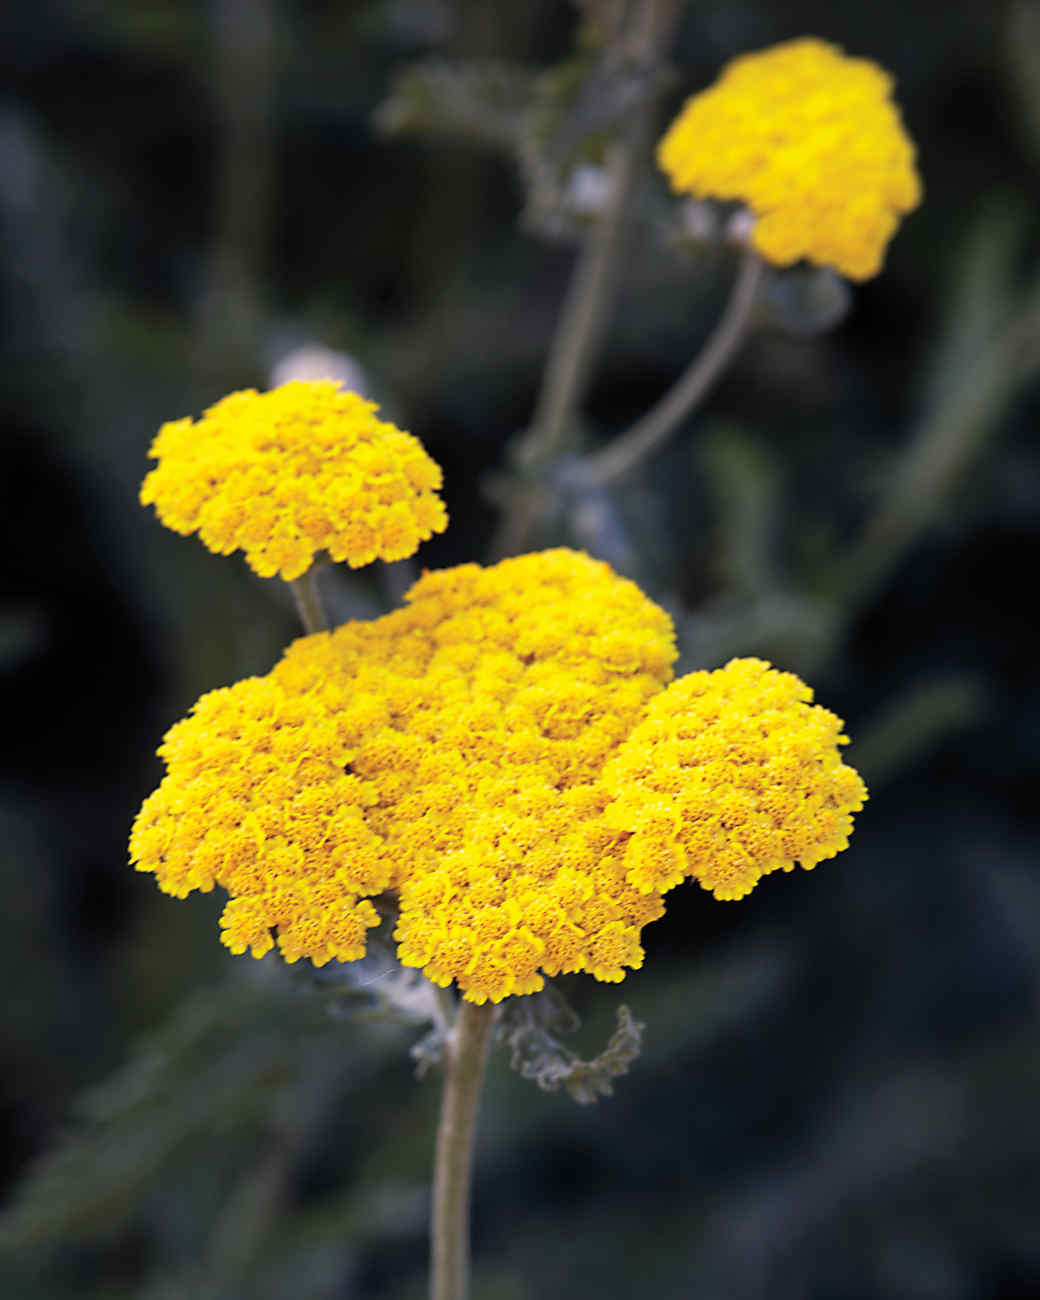 yellow-md110341.jpg